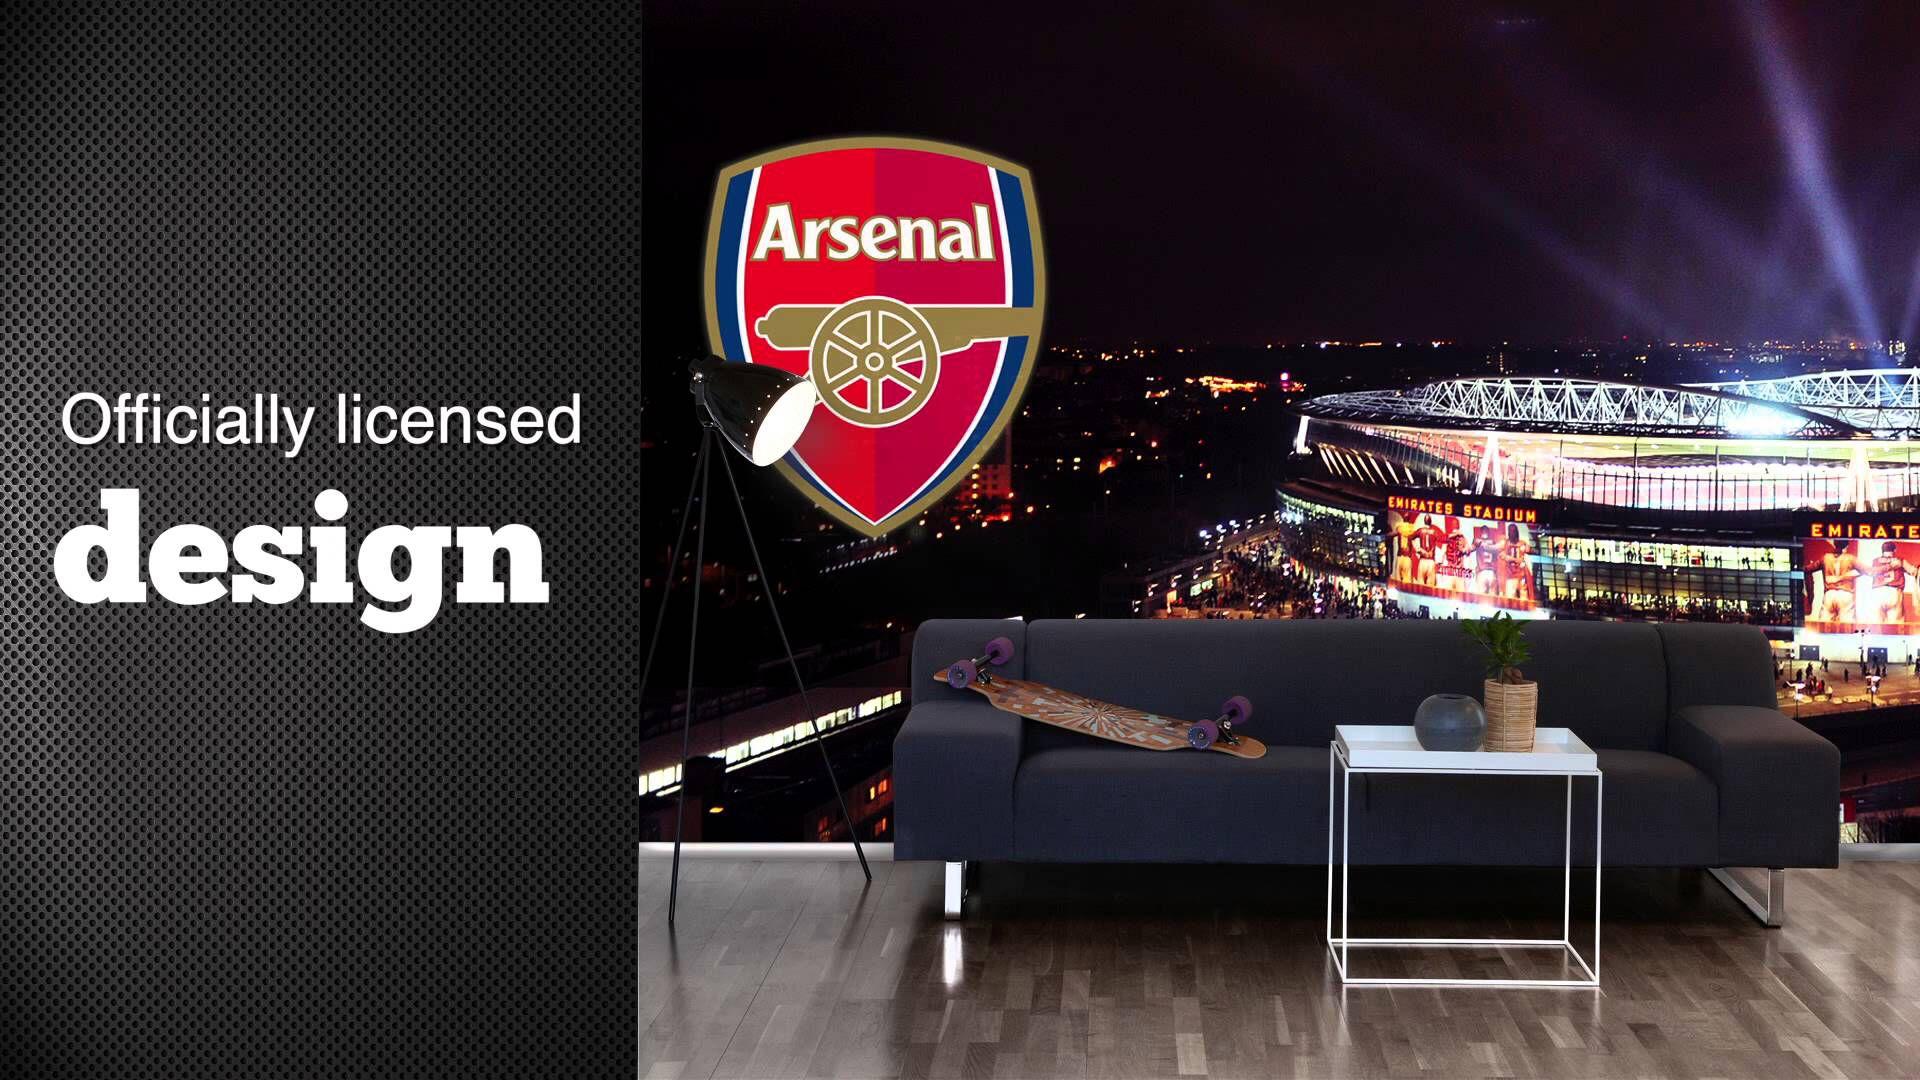 Arsenal arsenal gymnastics scene